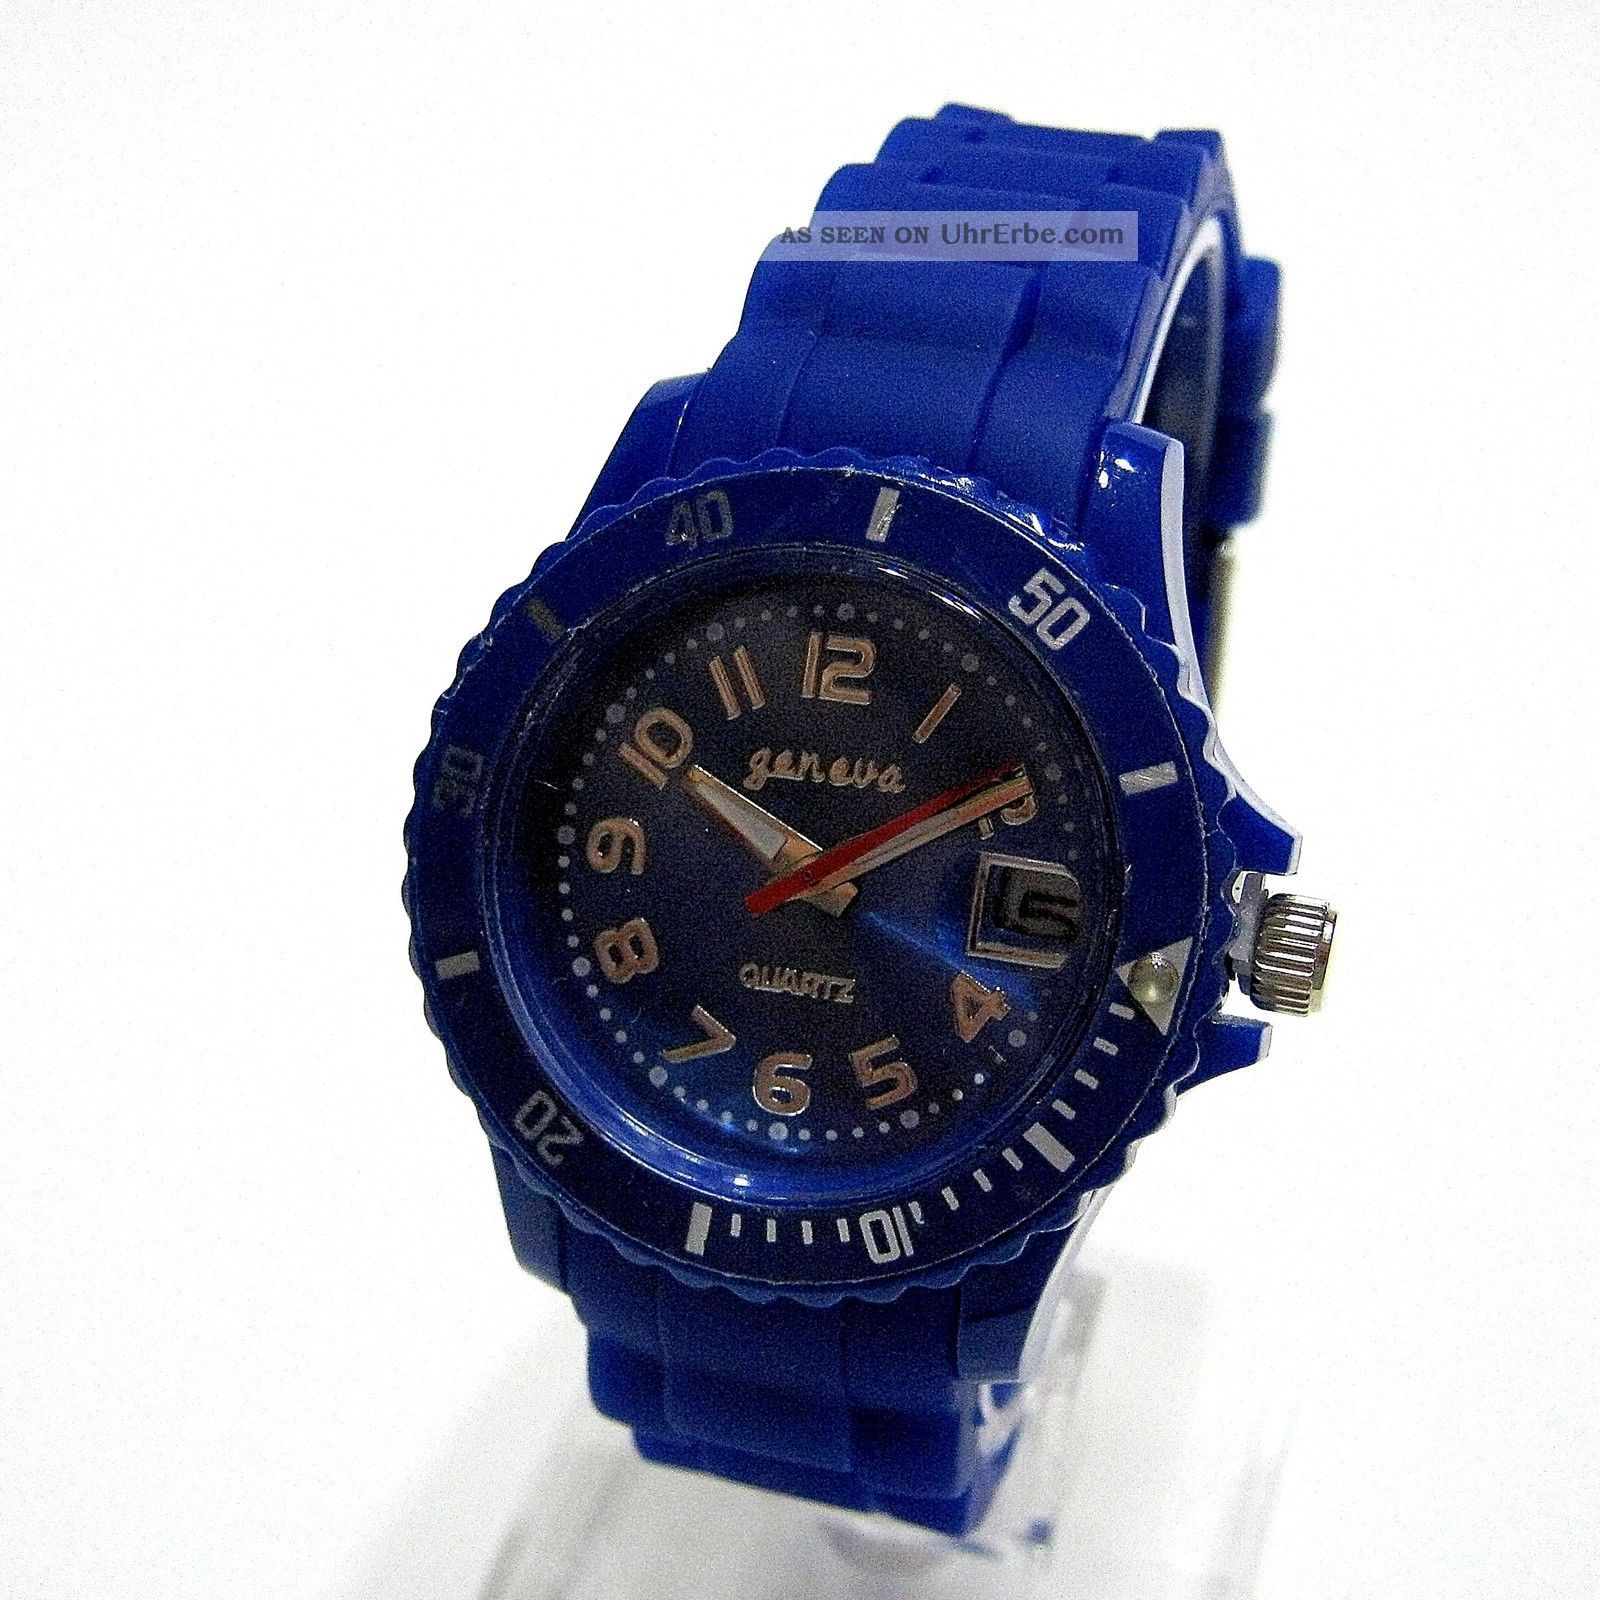 Geneva Silikon Uhr Mit Datum 35mm Sportuhr Armbanduhr